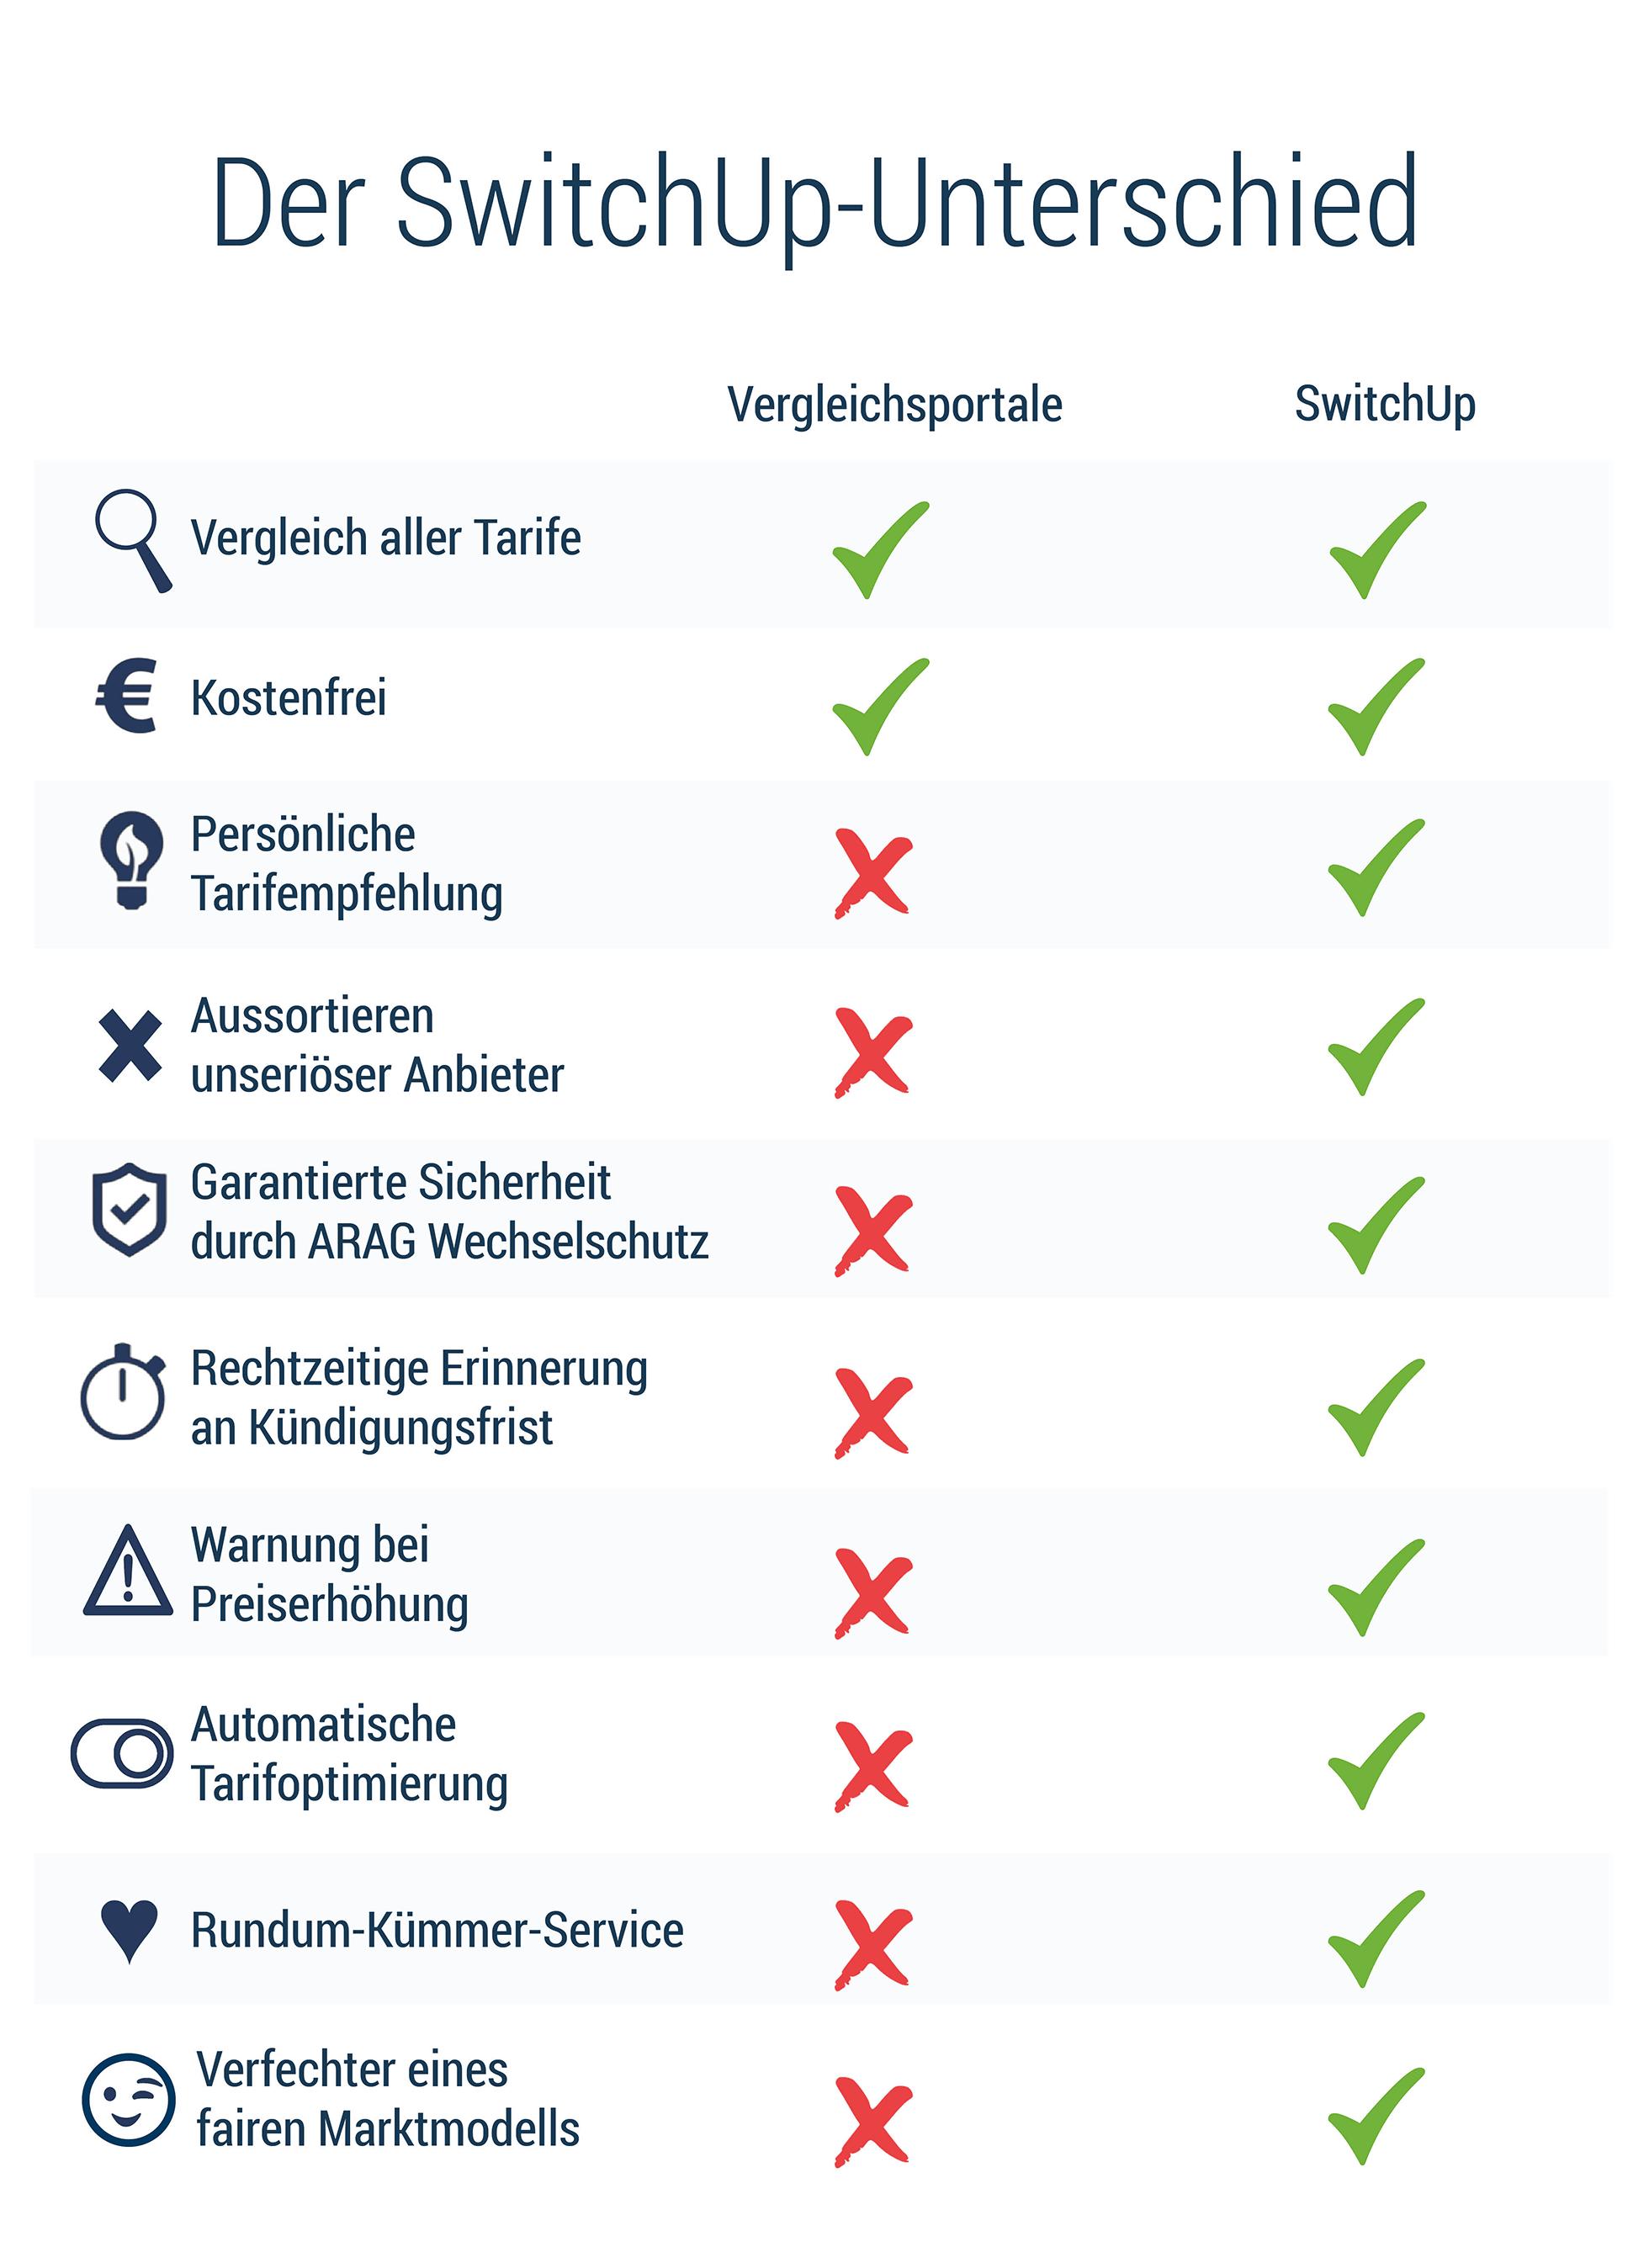 Vergleichsportale vs. SwitchUp